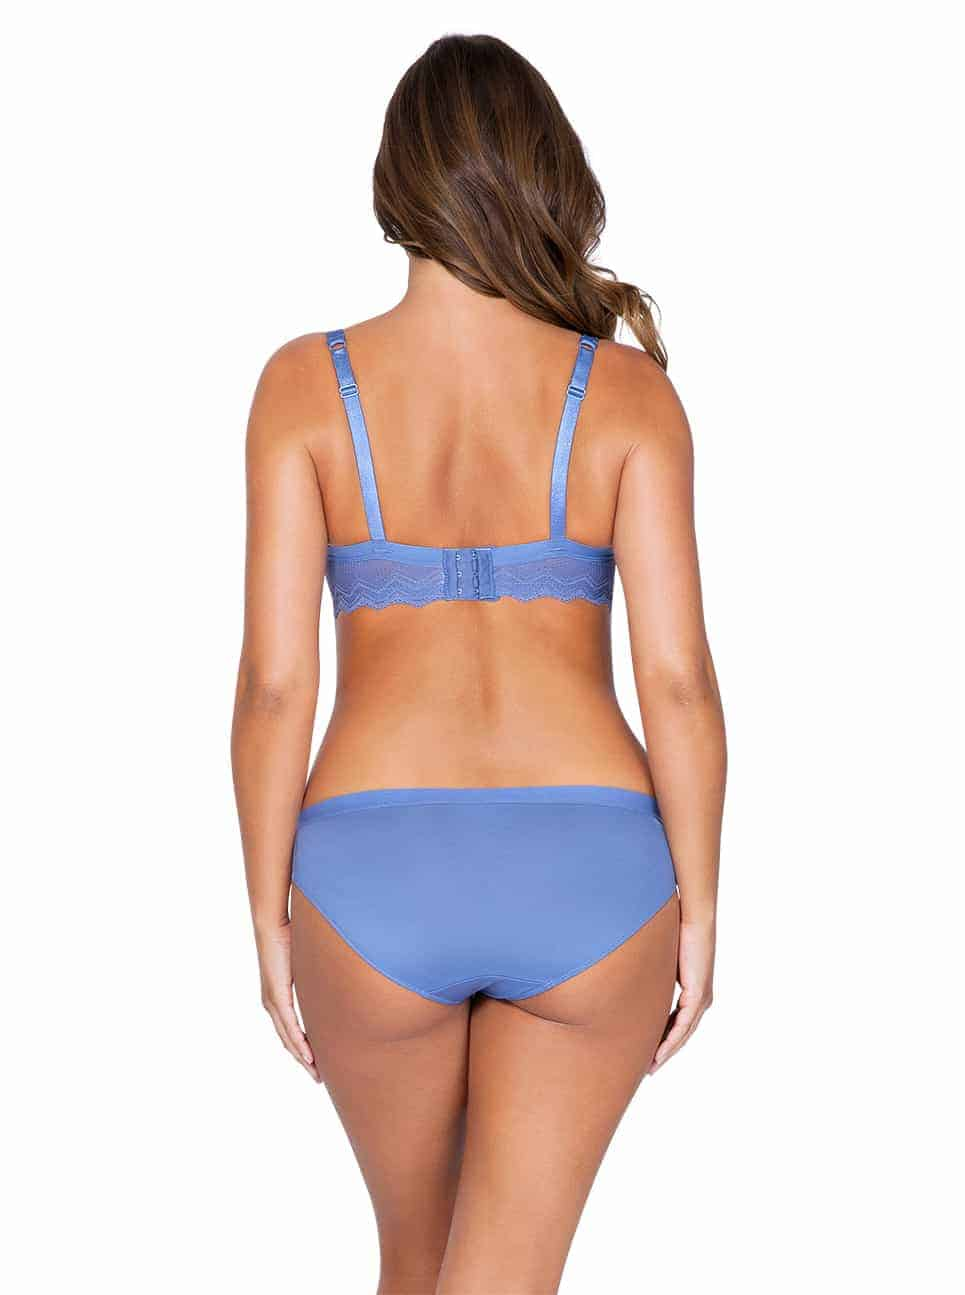 Lydie P5441ContourPadded P5443 Bikini SilverBlueBack - Lydie Contour Padded Bra – Silver Blue – P5441